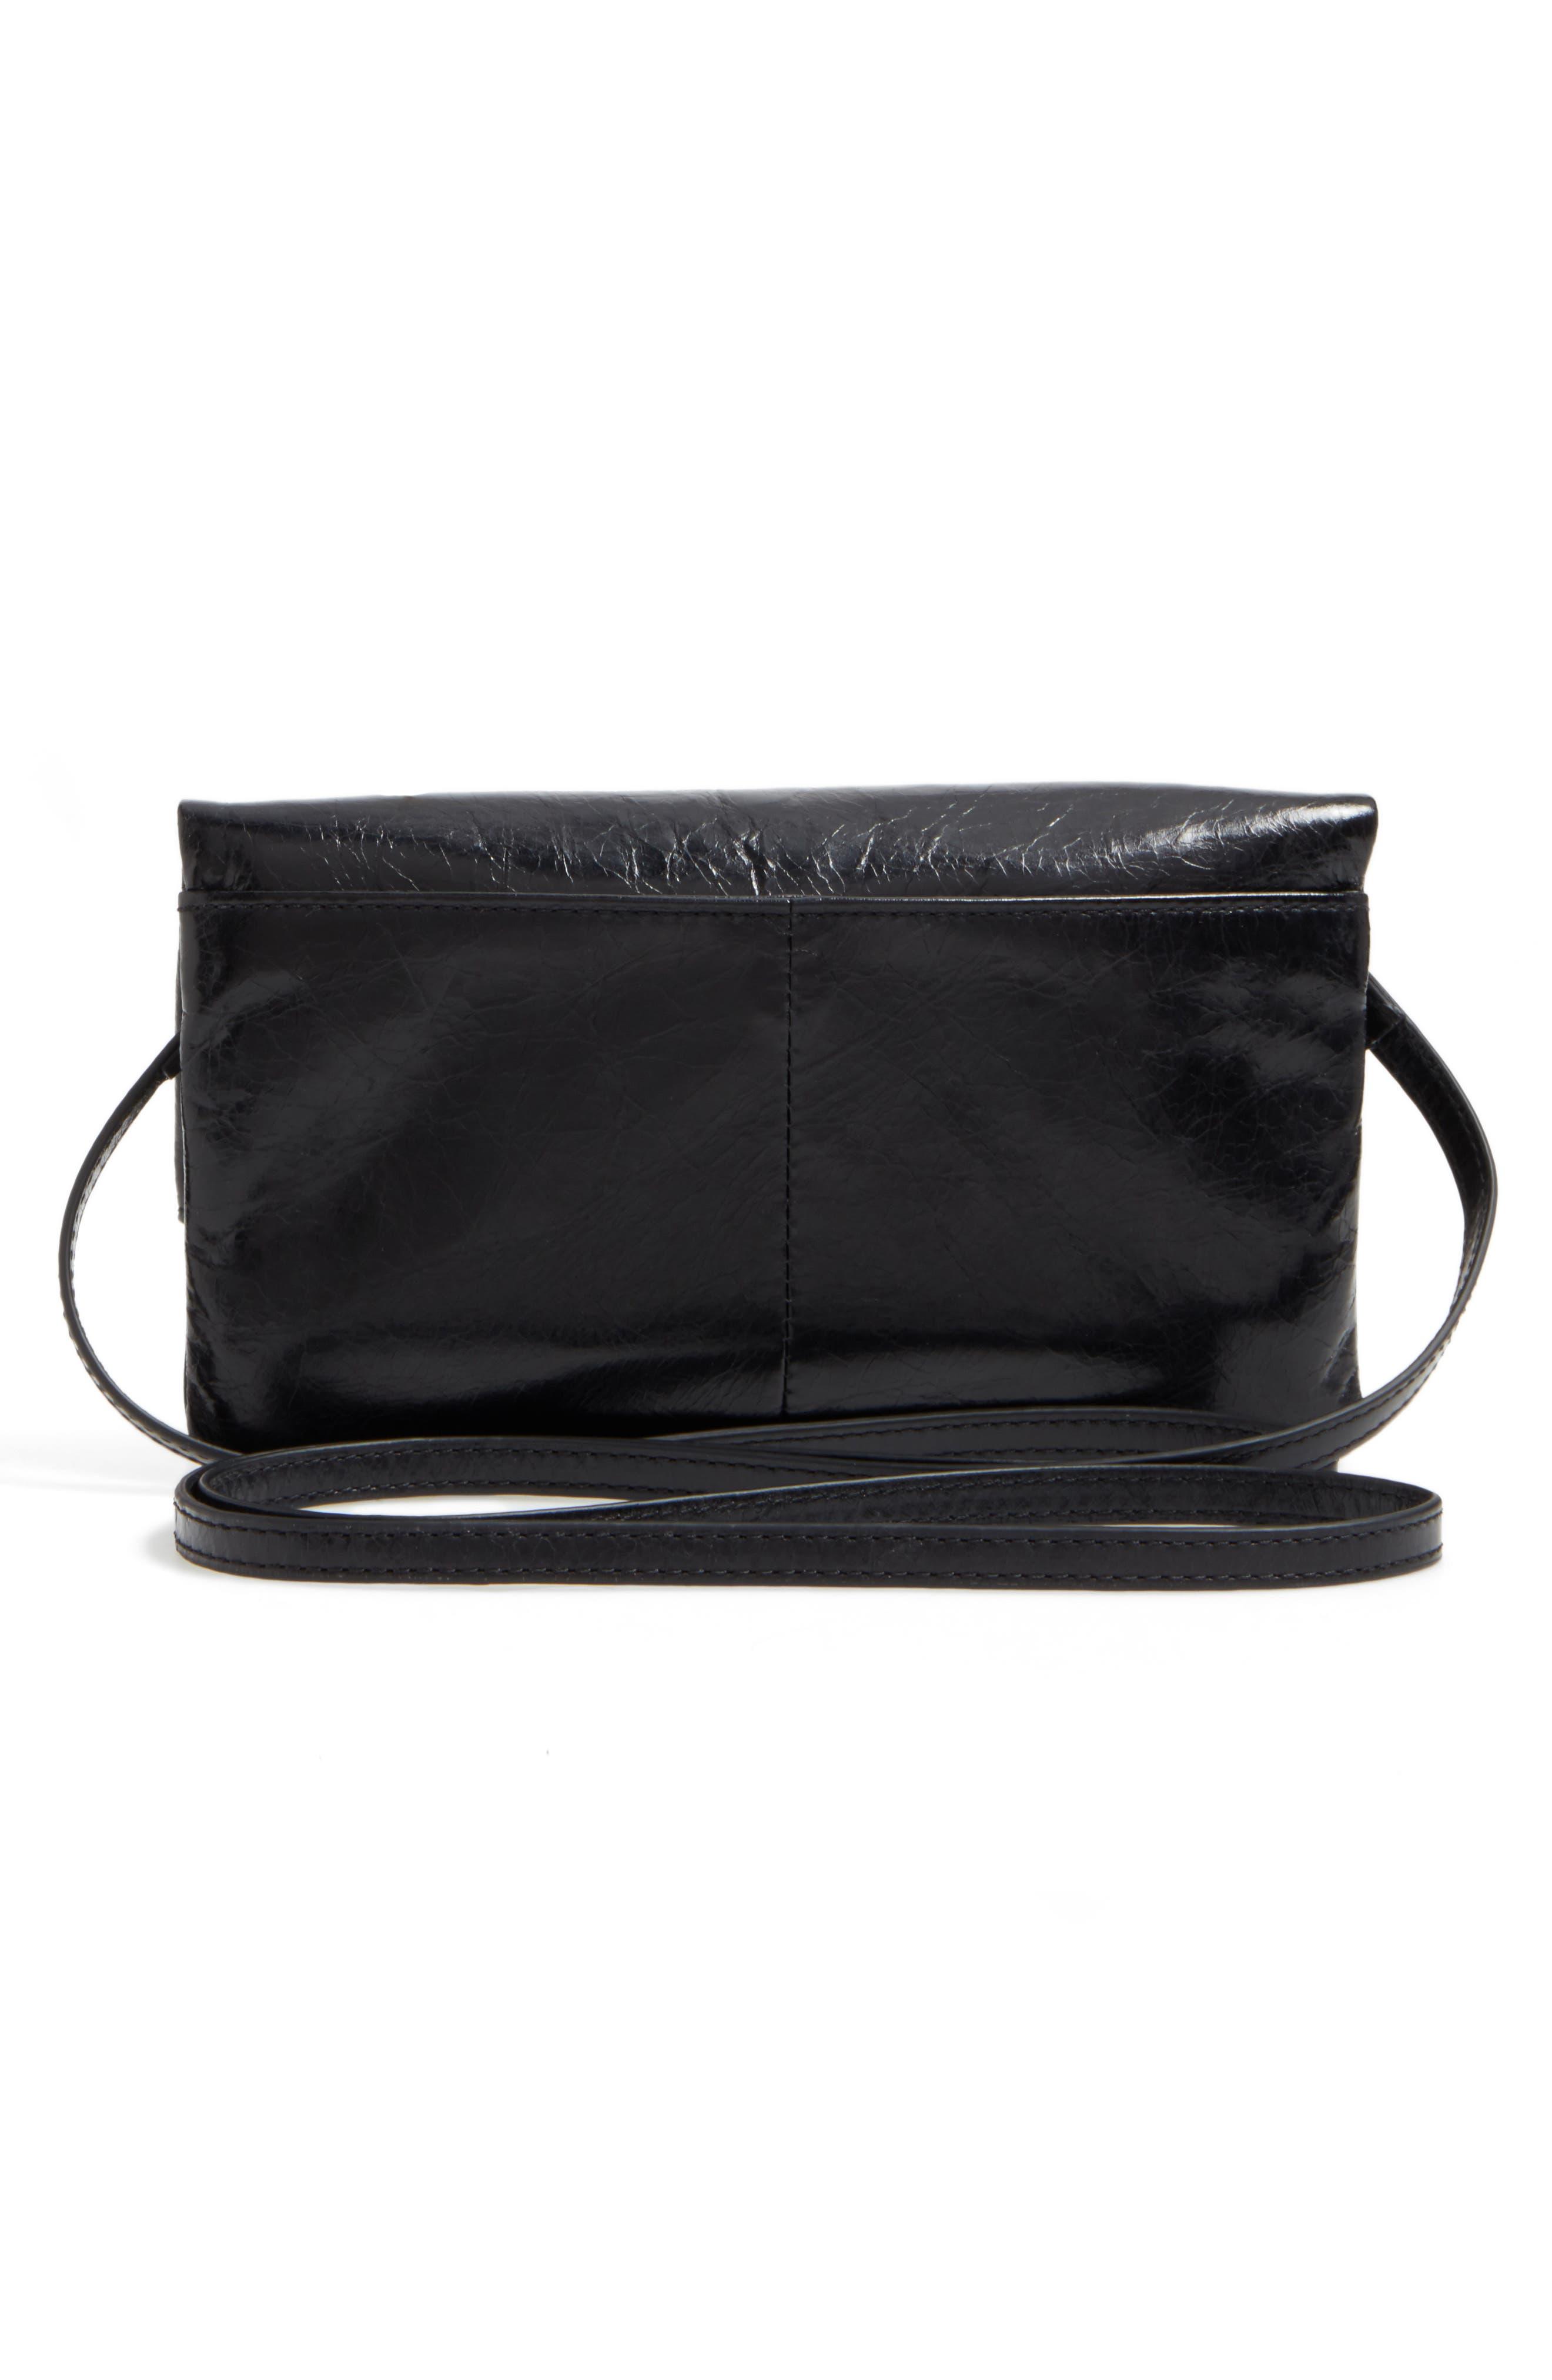 Rudy Leather Crossbody Bag,                             Alternate thumbnail 3, color,                             001